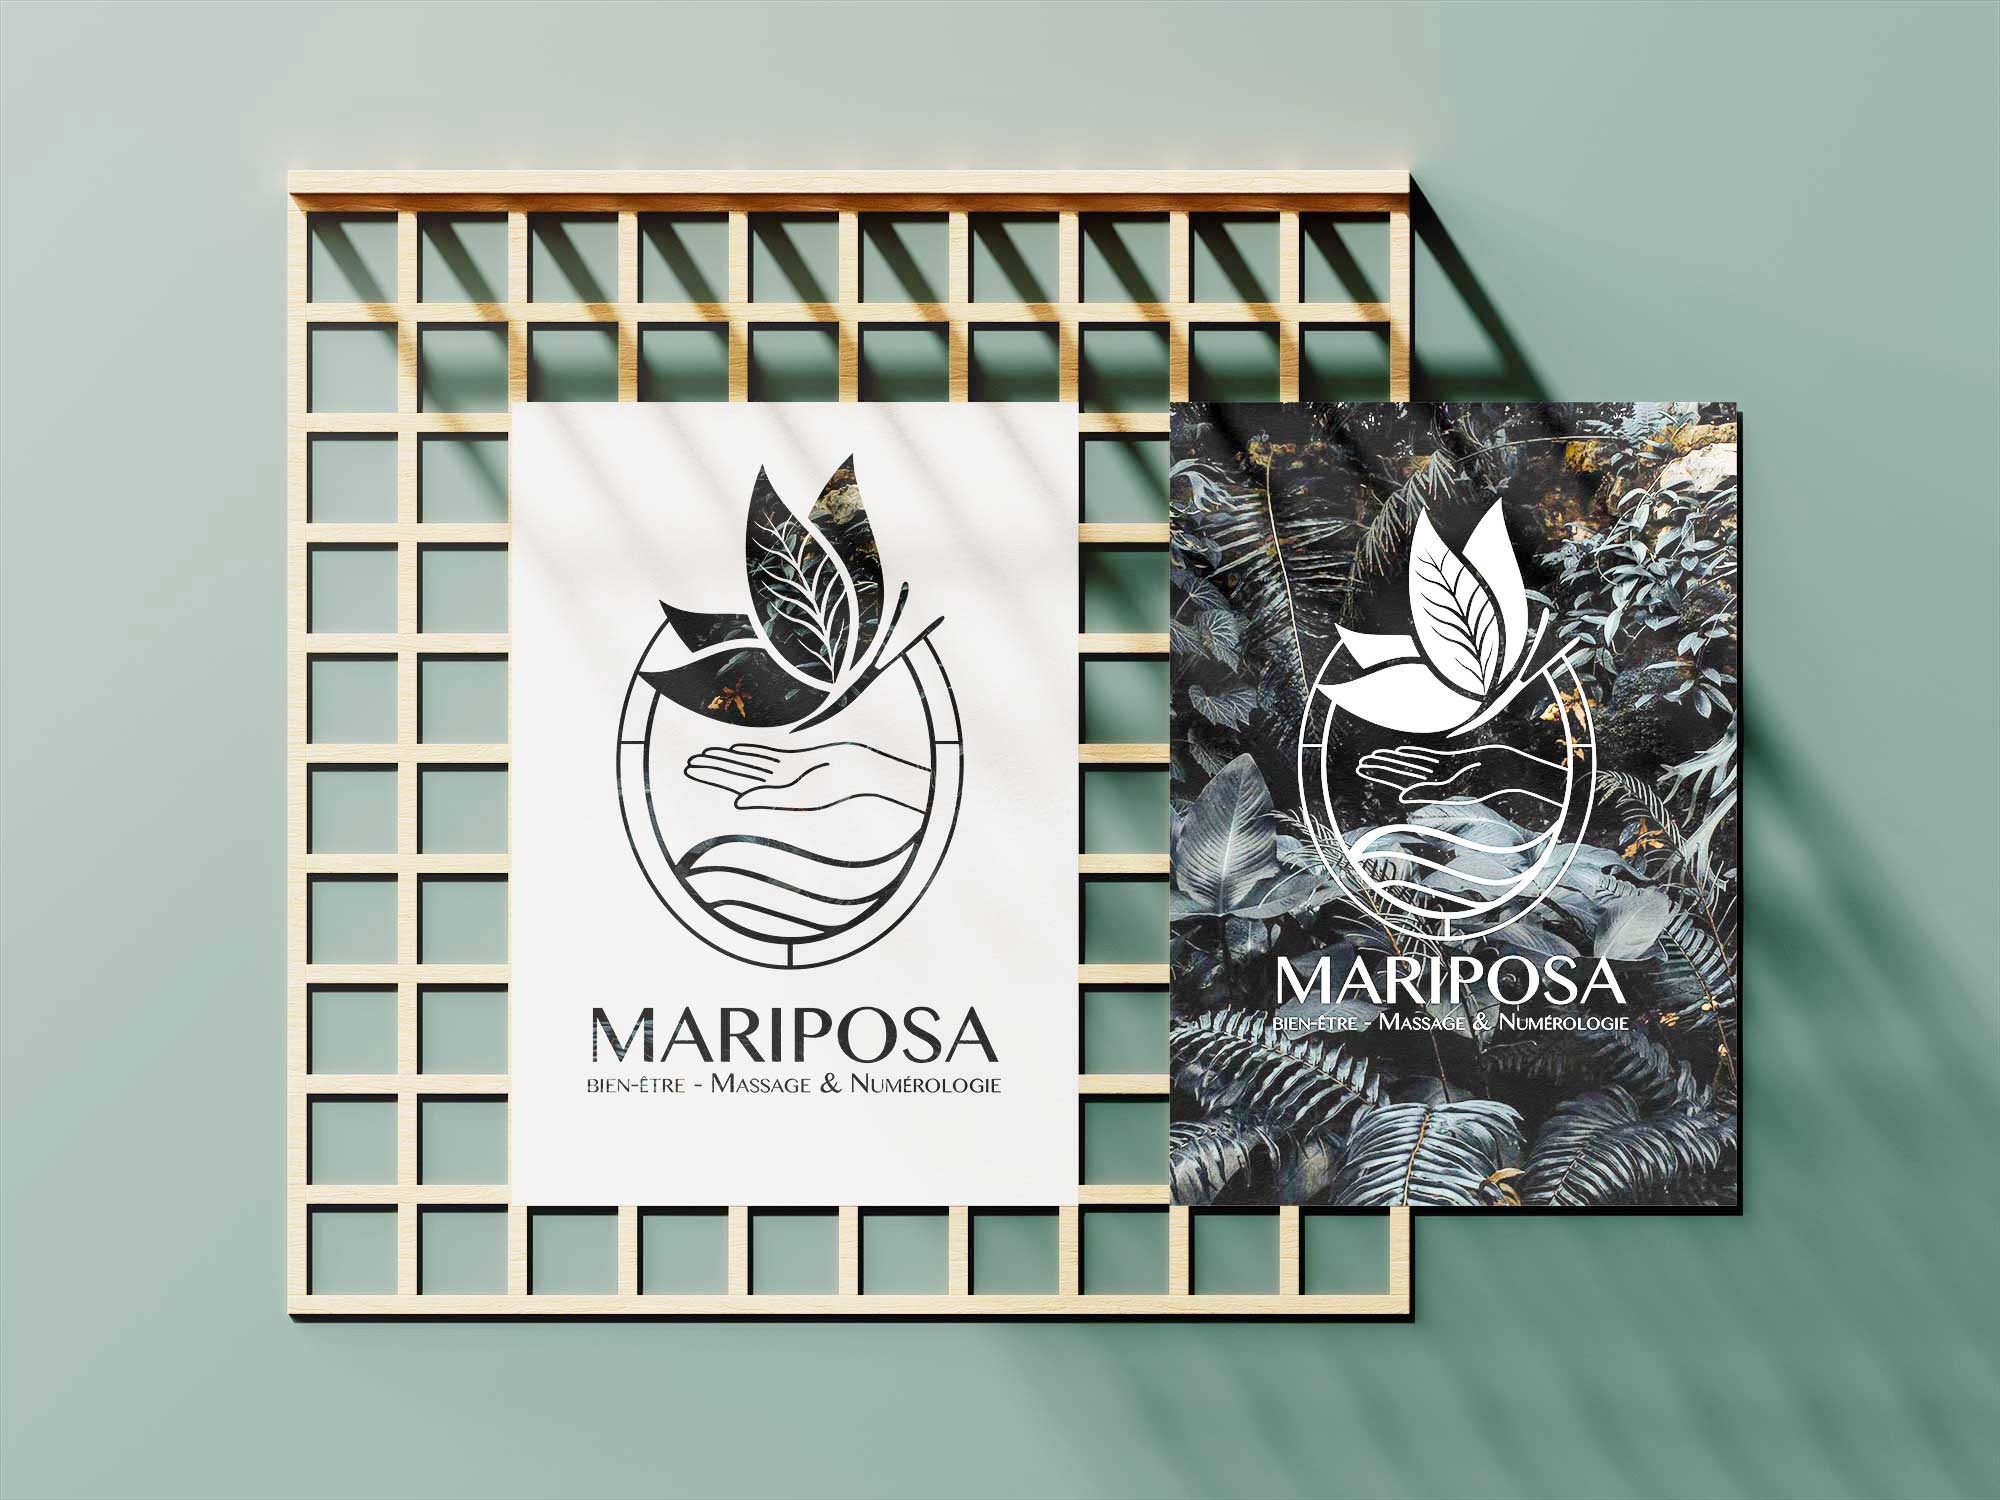 logo-mariposa-capbreton-bienetre-numerologie-massage-energie-equilibre-huiles-bio